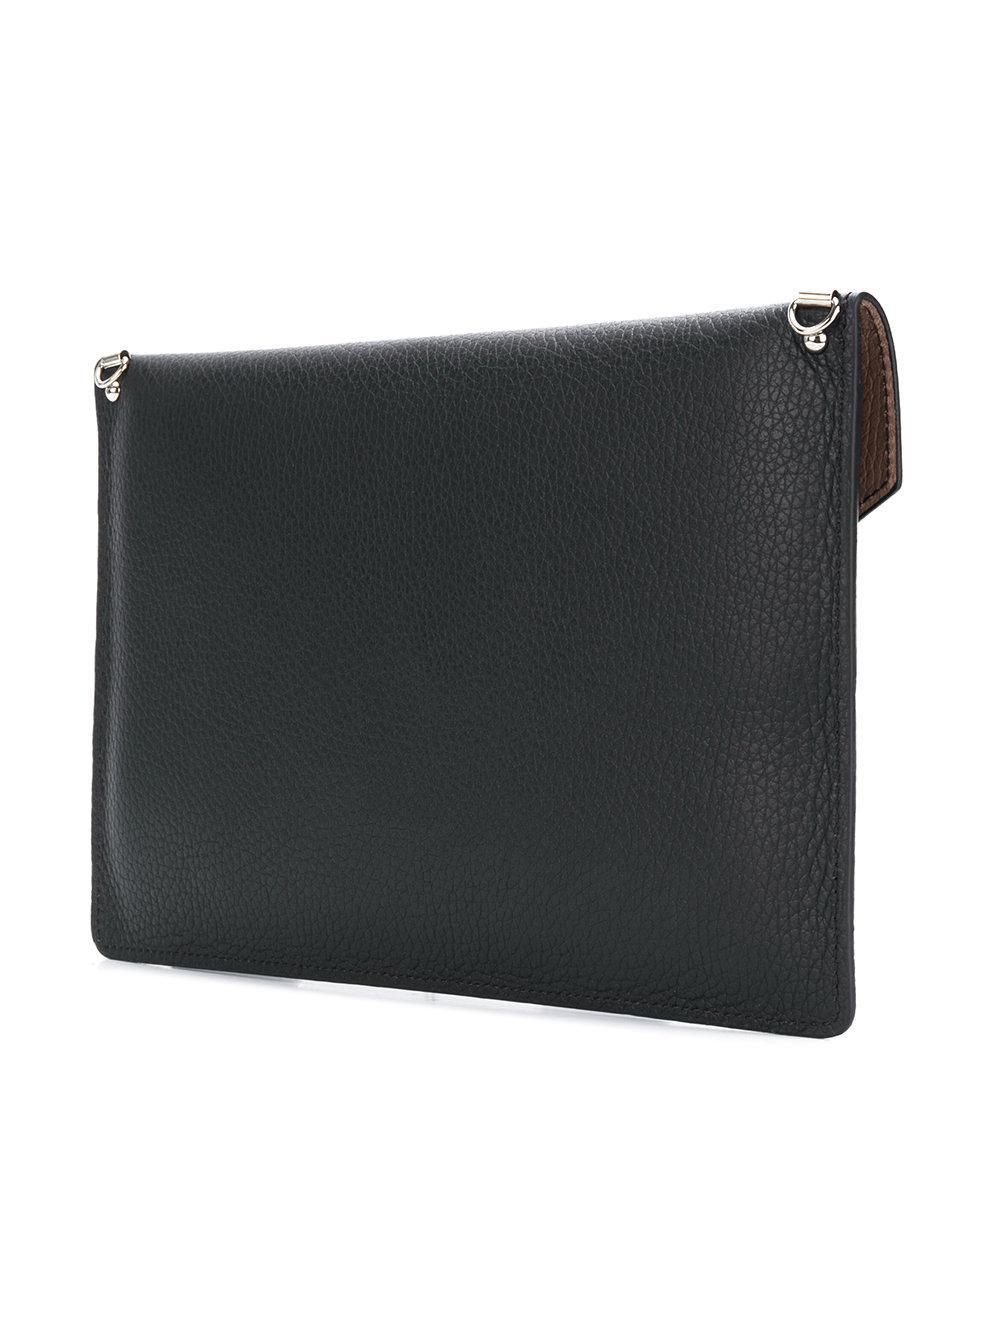 Lancaster Leather Foldover Envelope Crossbody Bag in Black